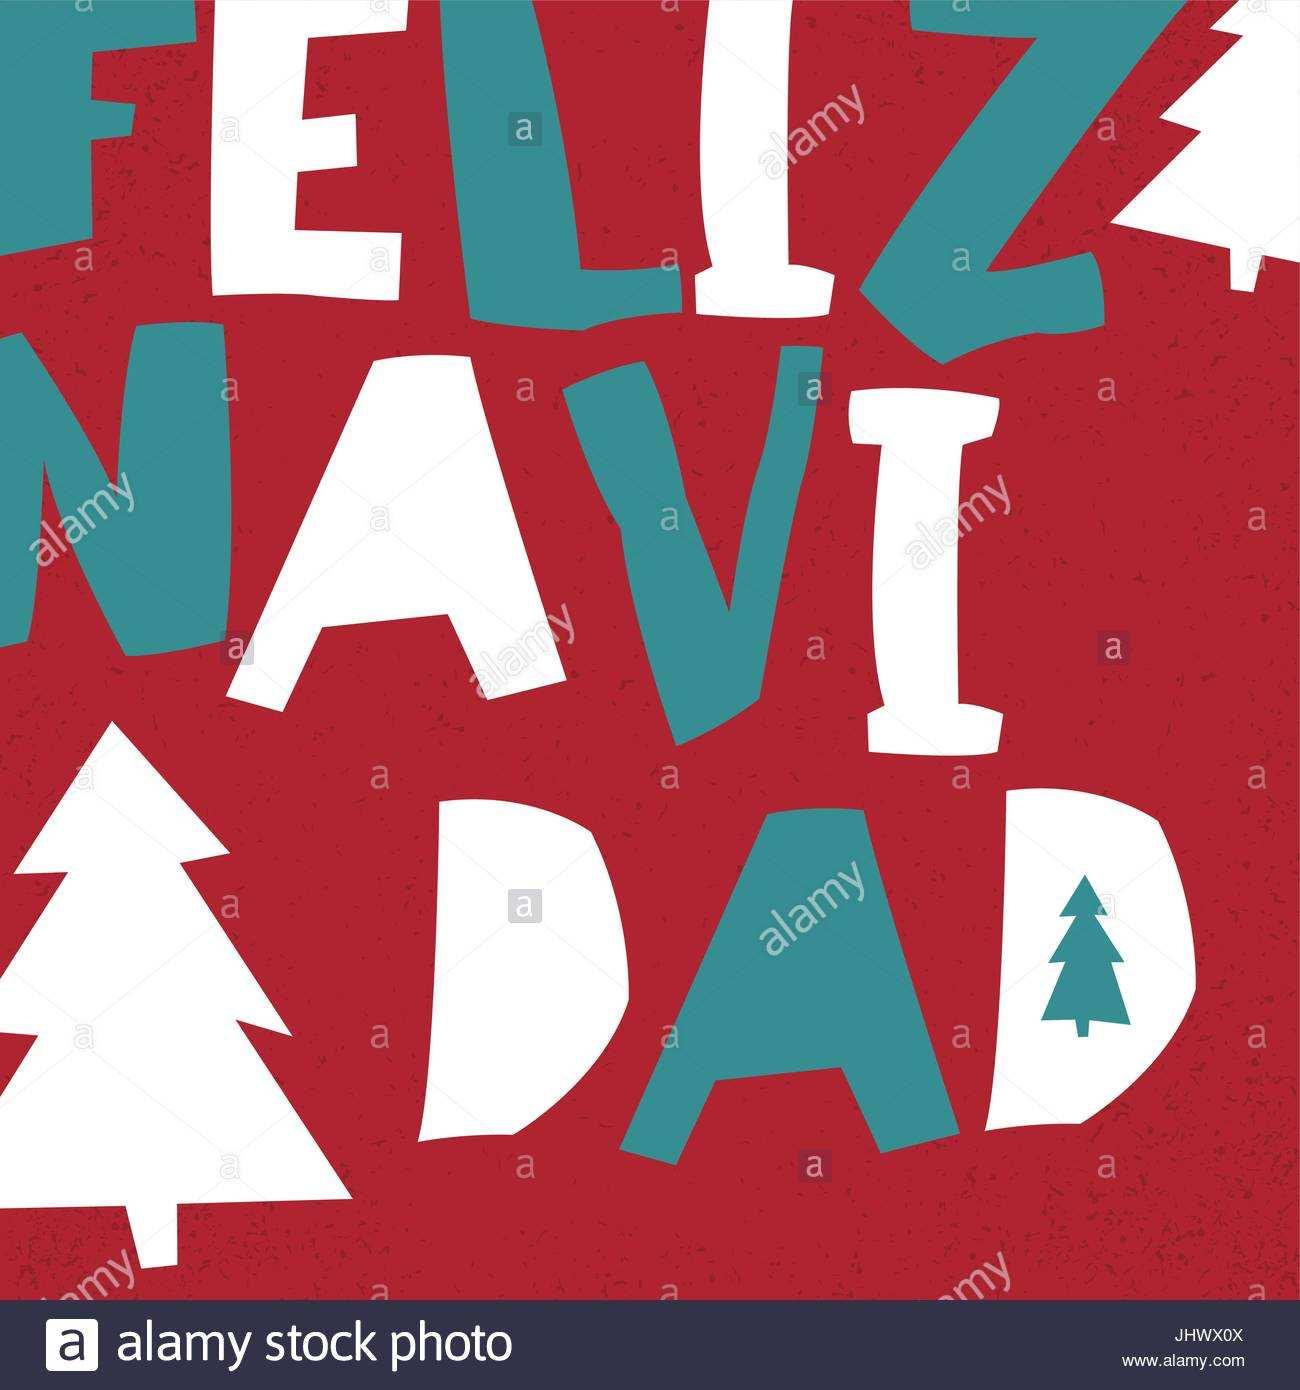 73 Creative Christmas Card Template In Spanish PSD File for Christmas Card Template In Spanish